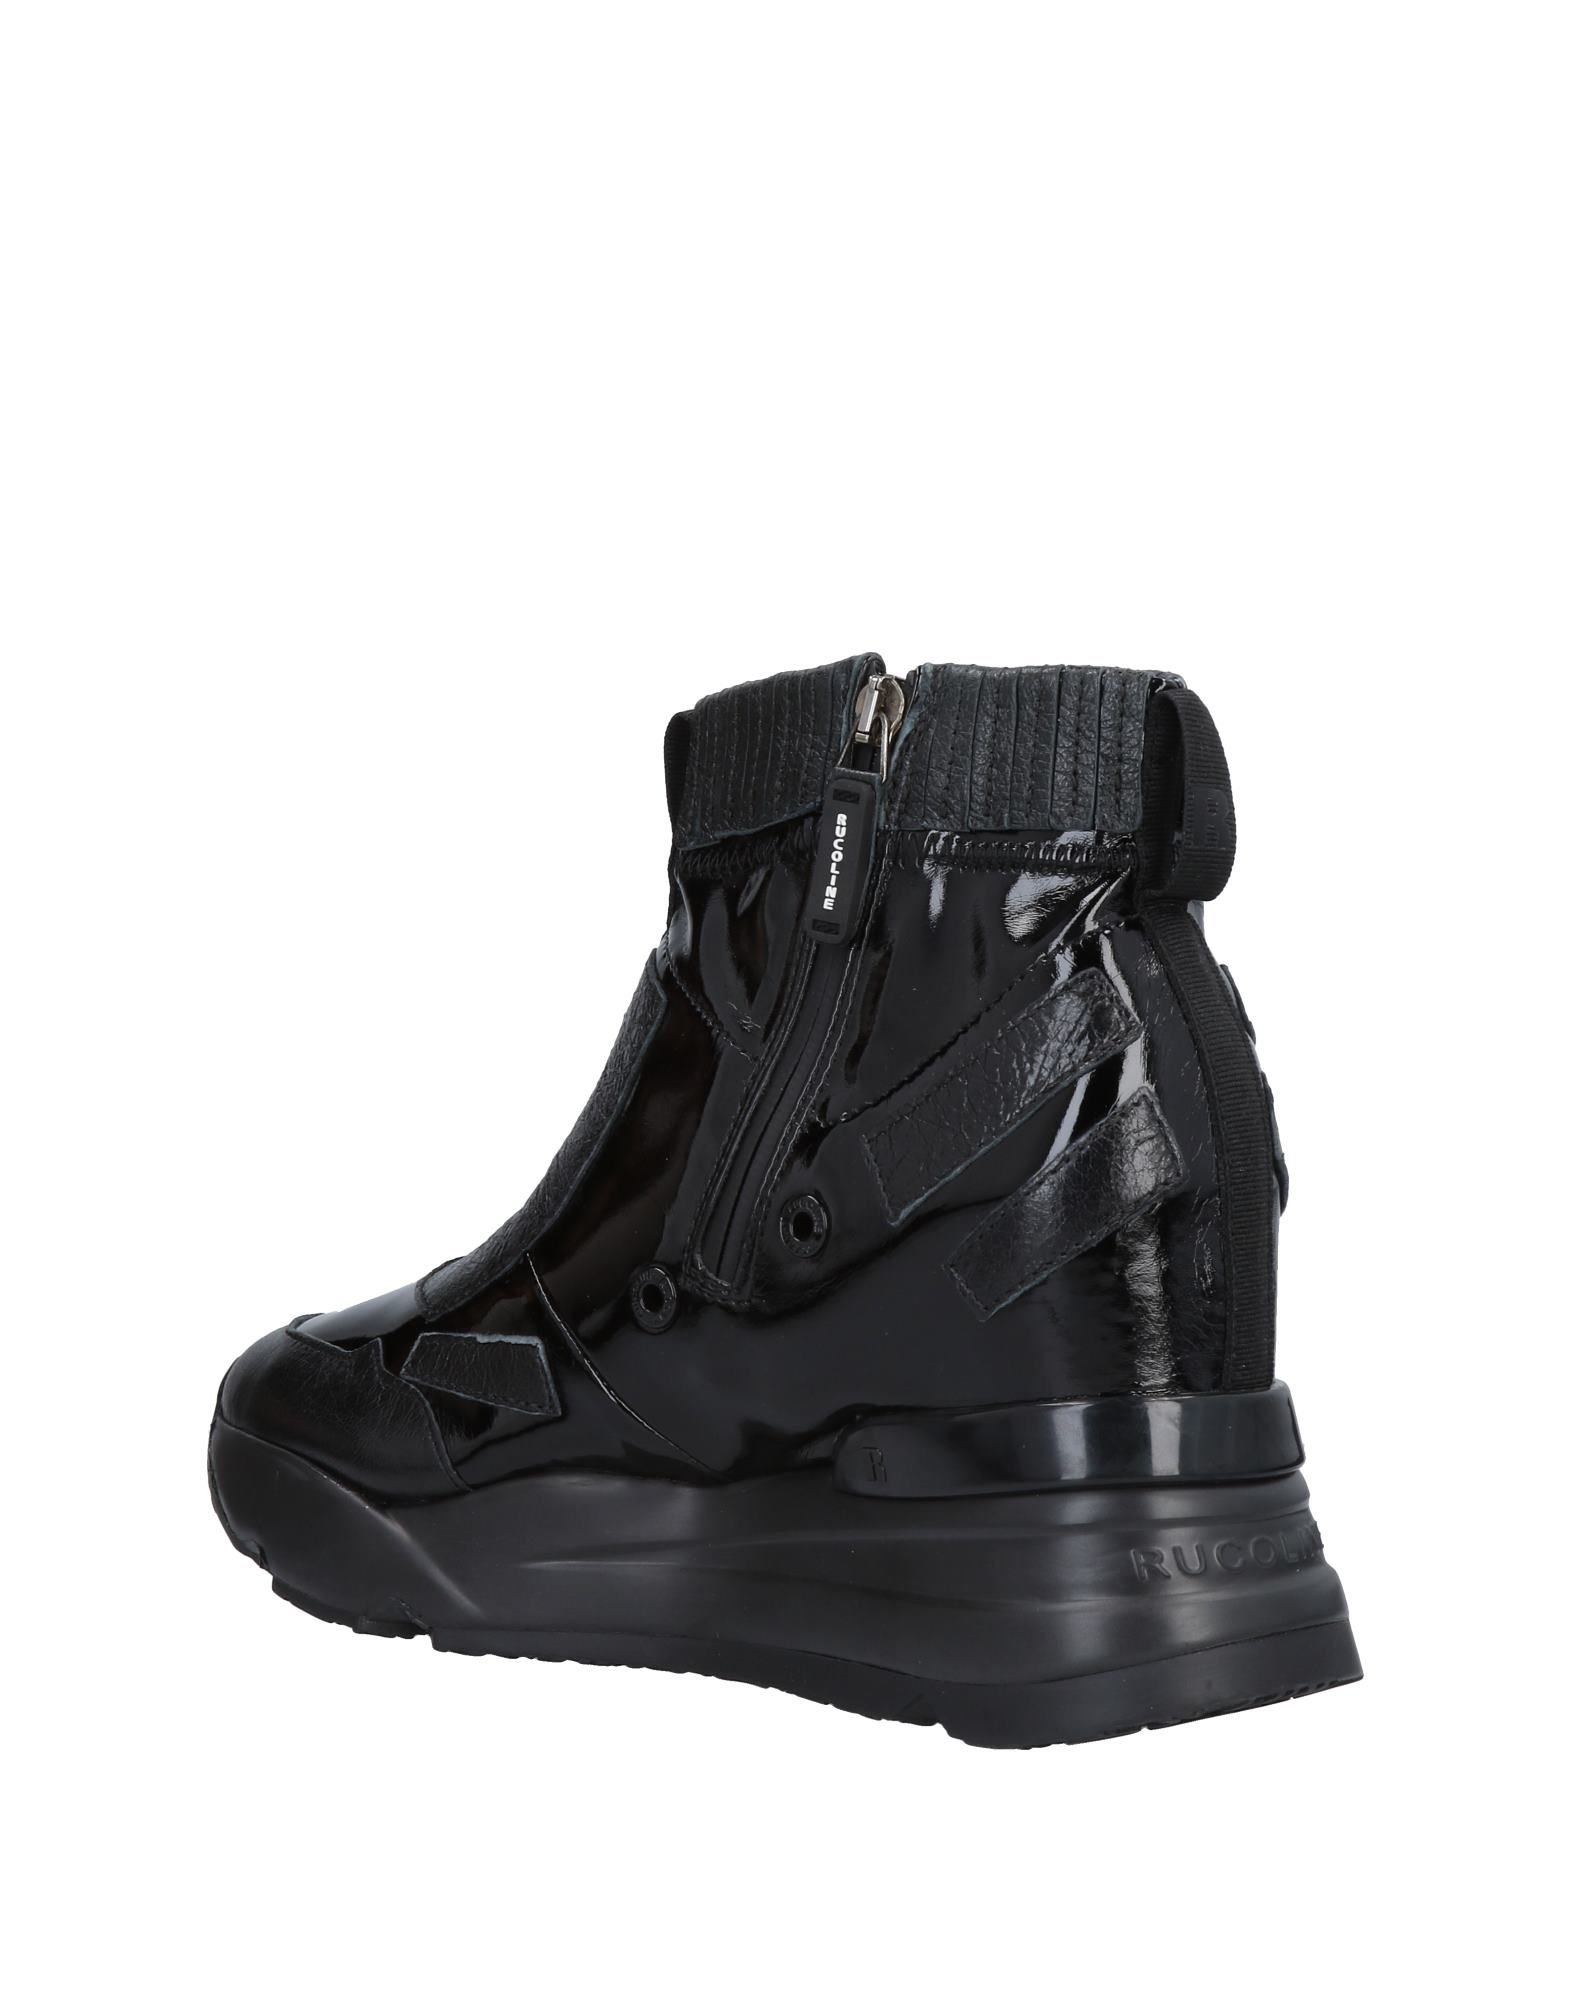 Ruco Line Sneakers Damen beliebte  11476941SB Gute Qualität beliebte Damen Schuhe fbcff2